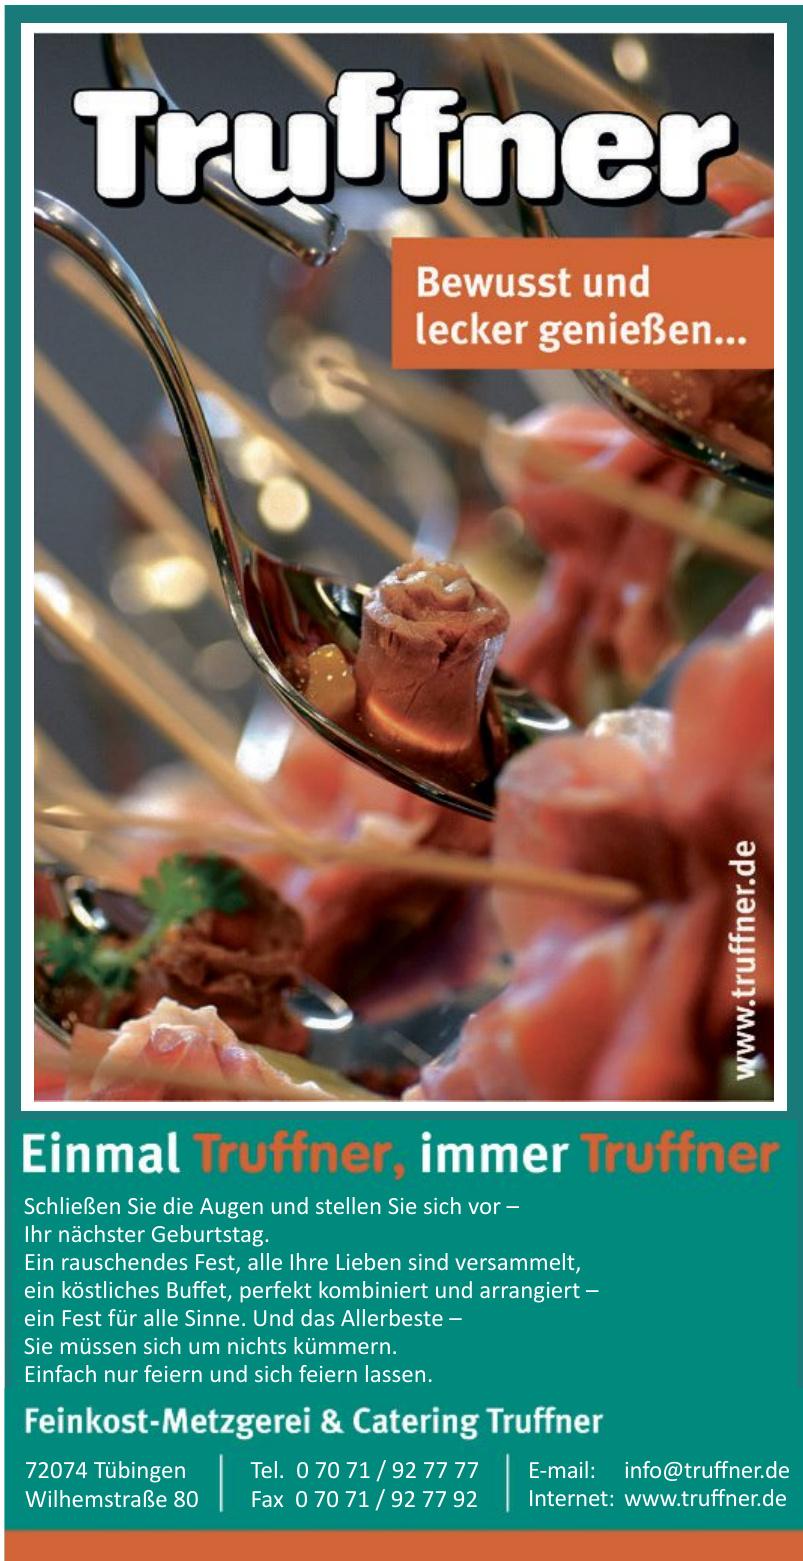 Feinkost-Metzgerei & Catering Truffner